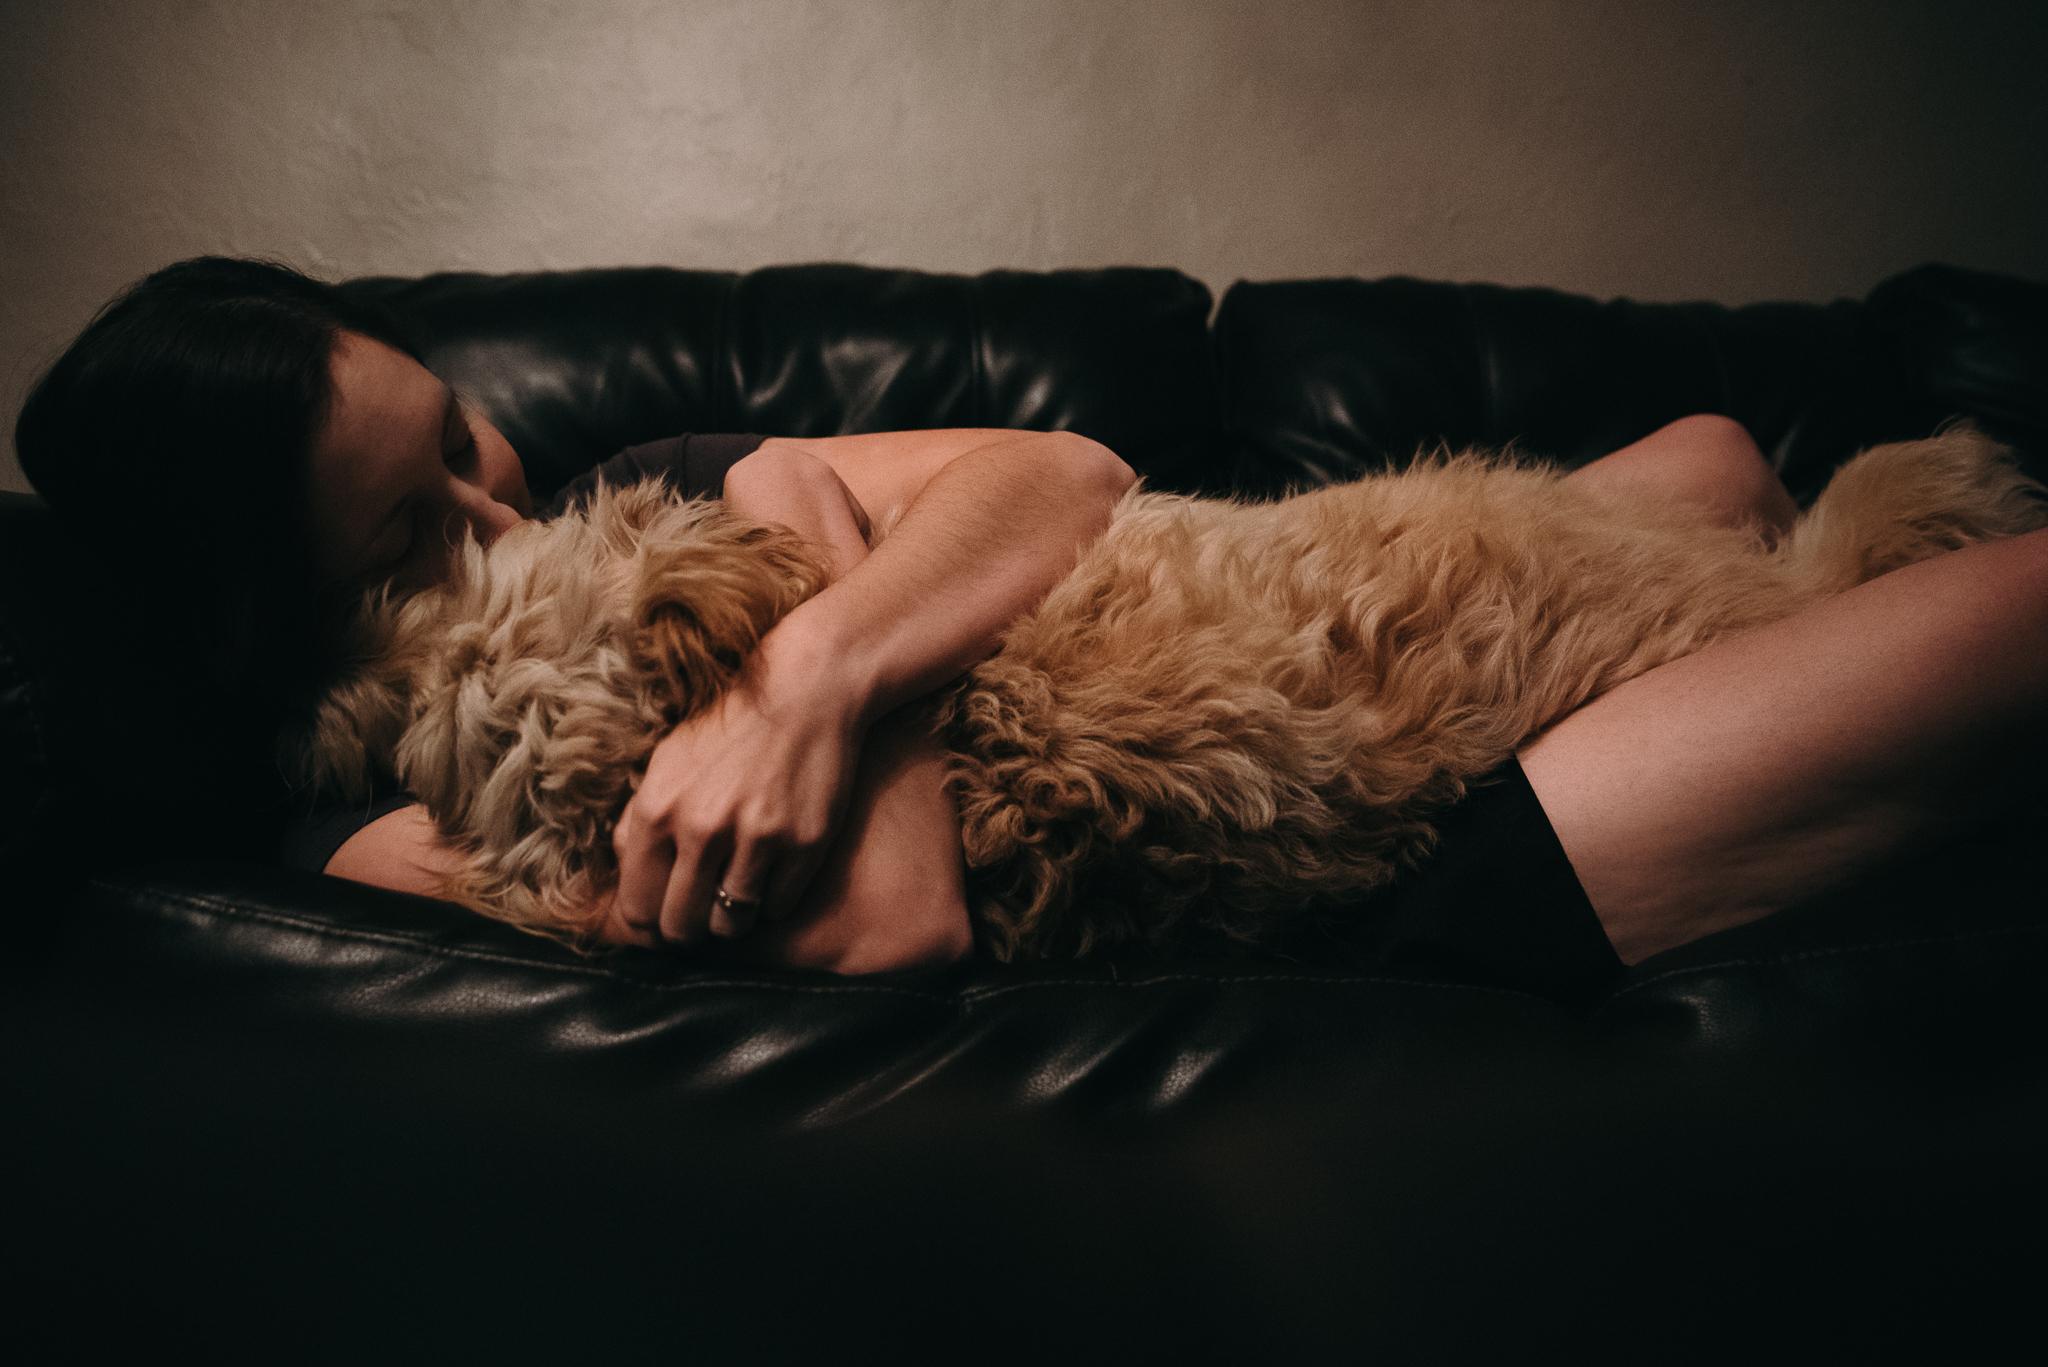 Girl with dog cuddling